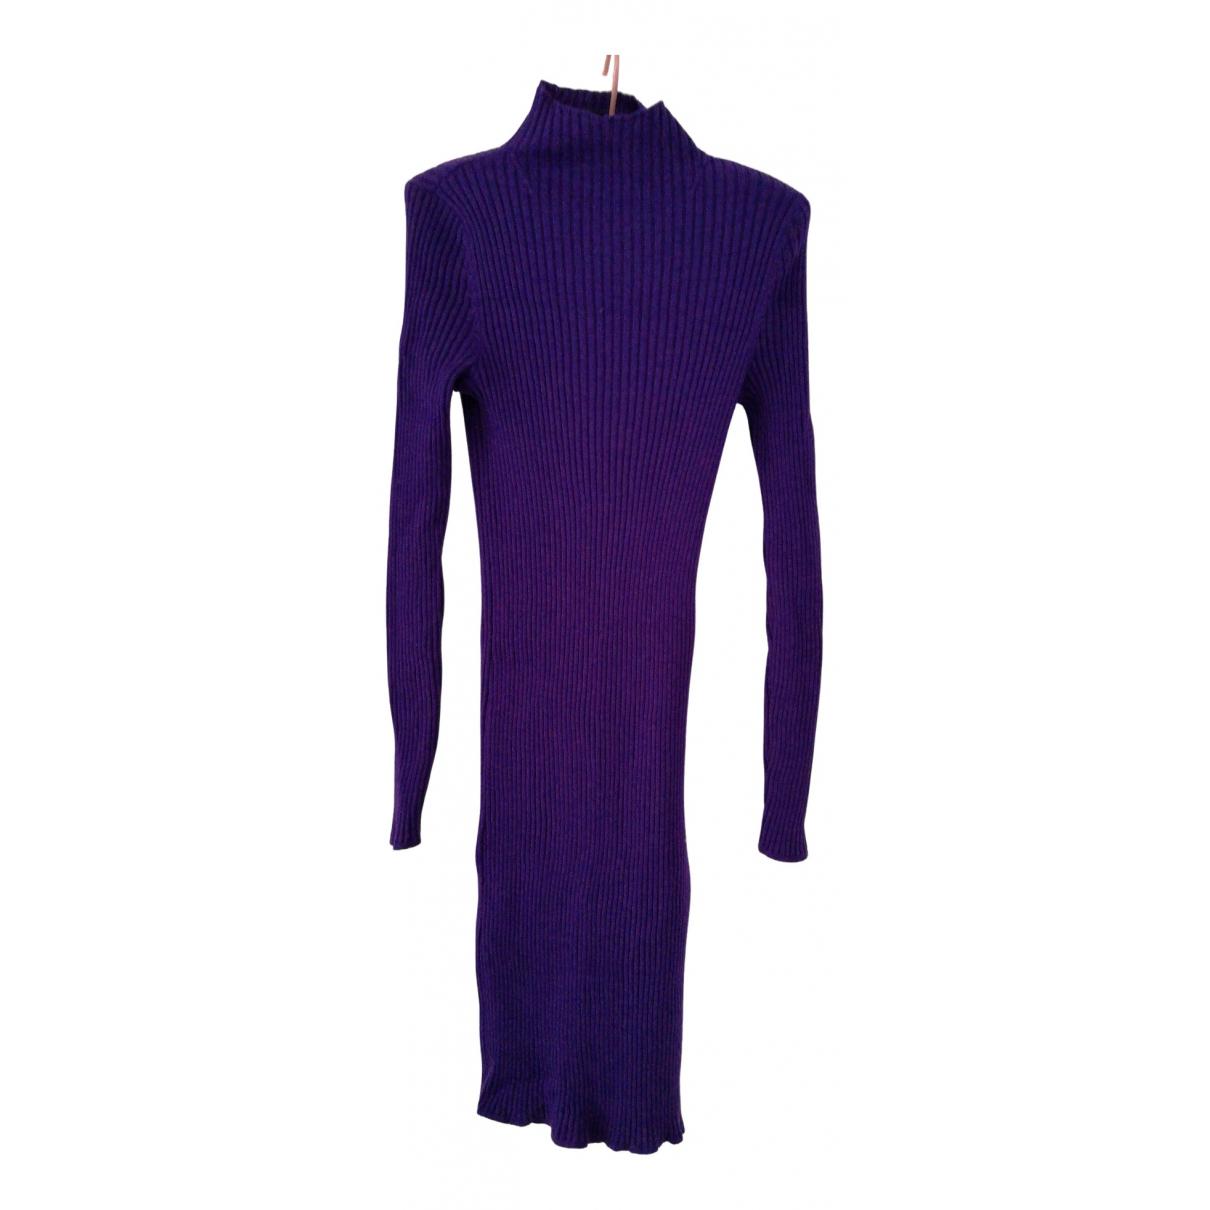 Lauren Ralph Lauren N Purple Wool dress for Women 38 FR